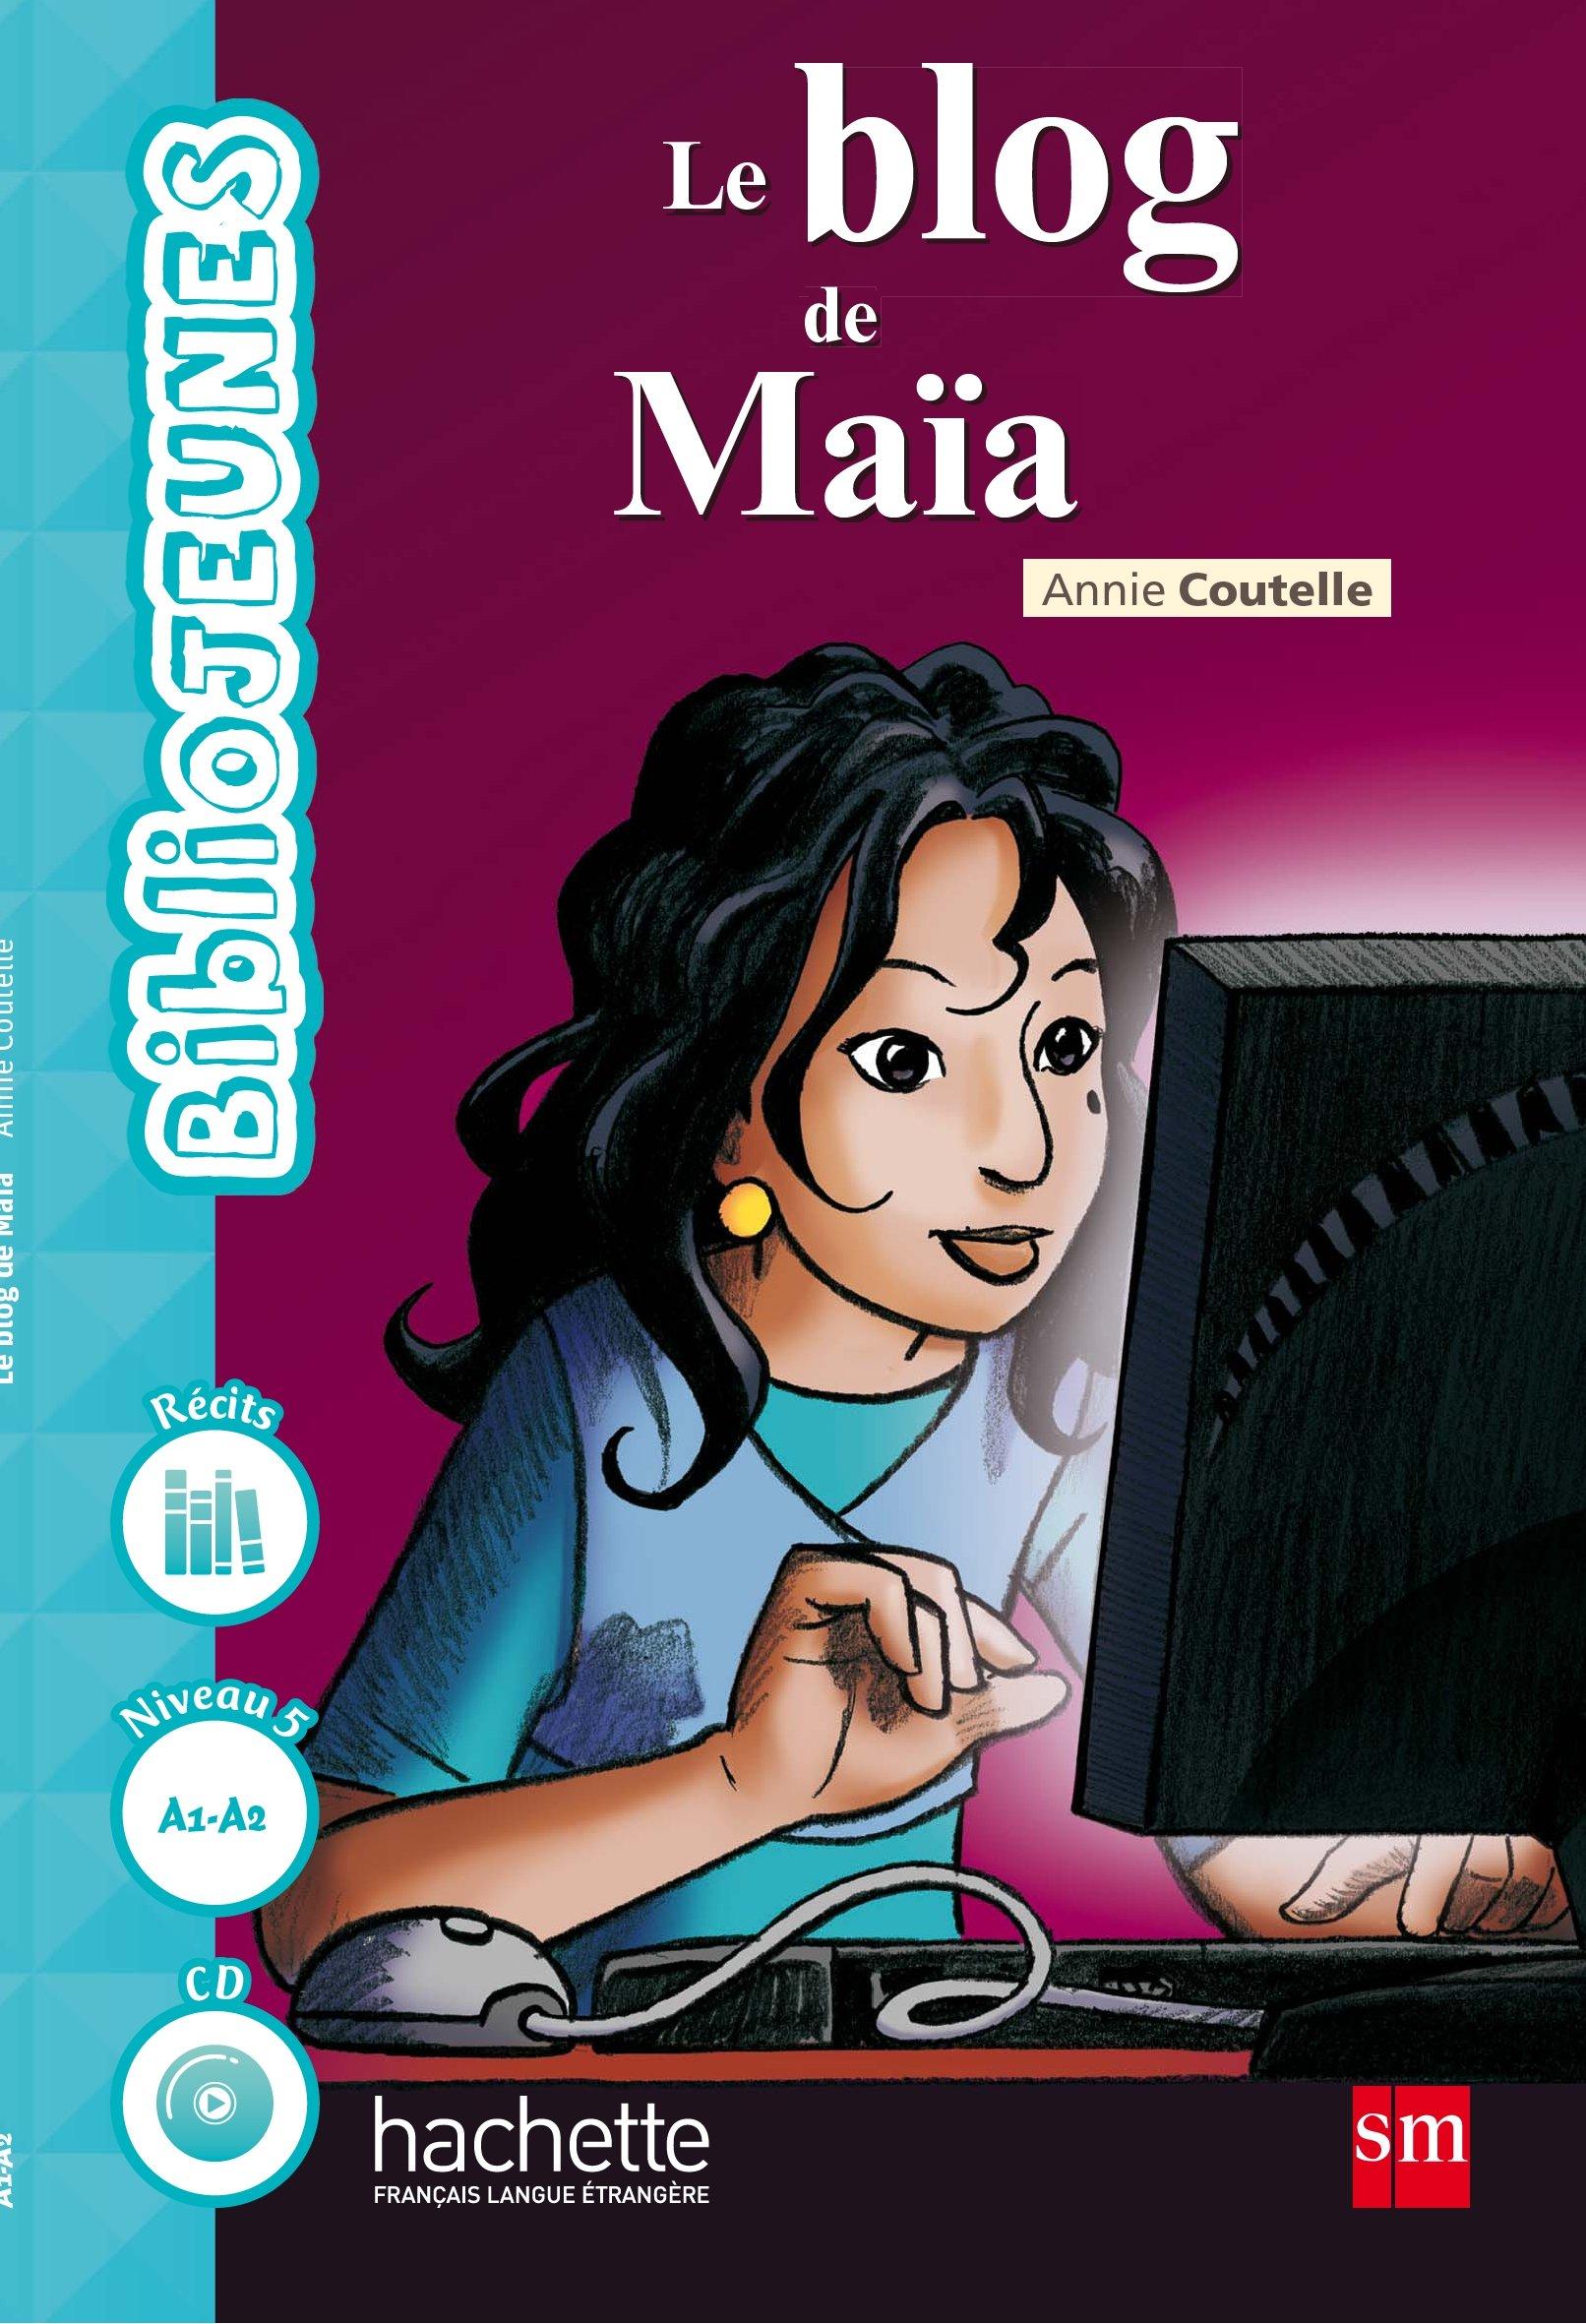 Le blog de Maïa - 9788467583656: Amazon.es: Annie Coutelle: Libros en idiomas extranjeros